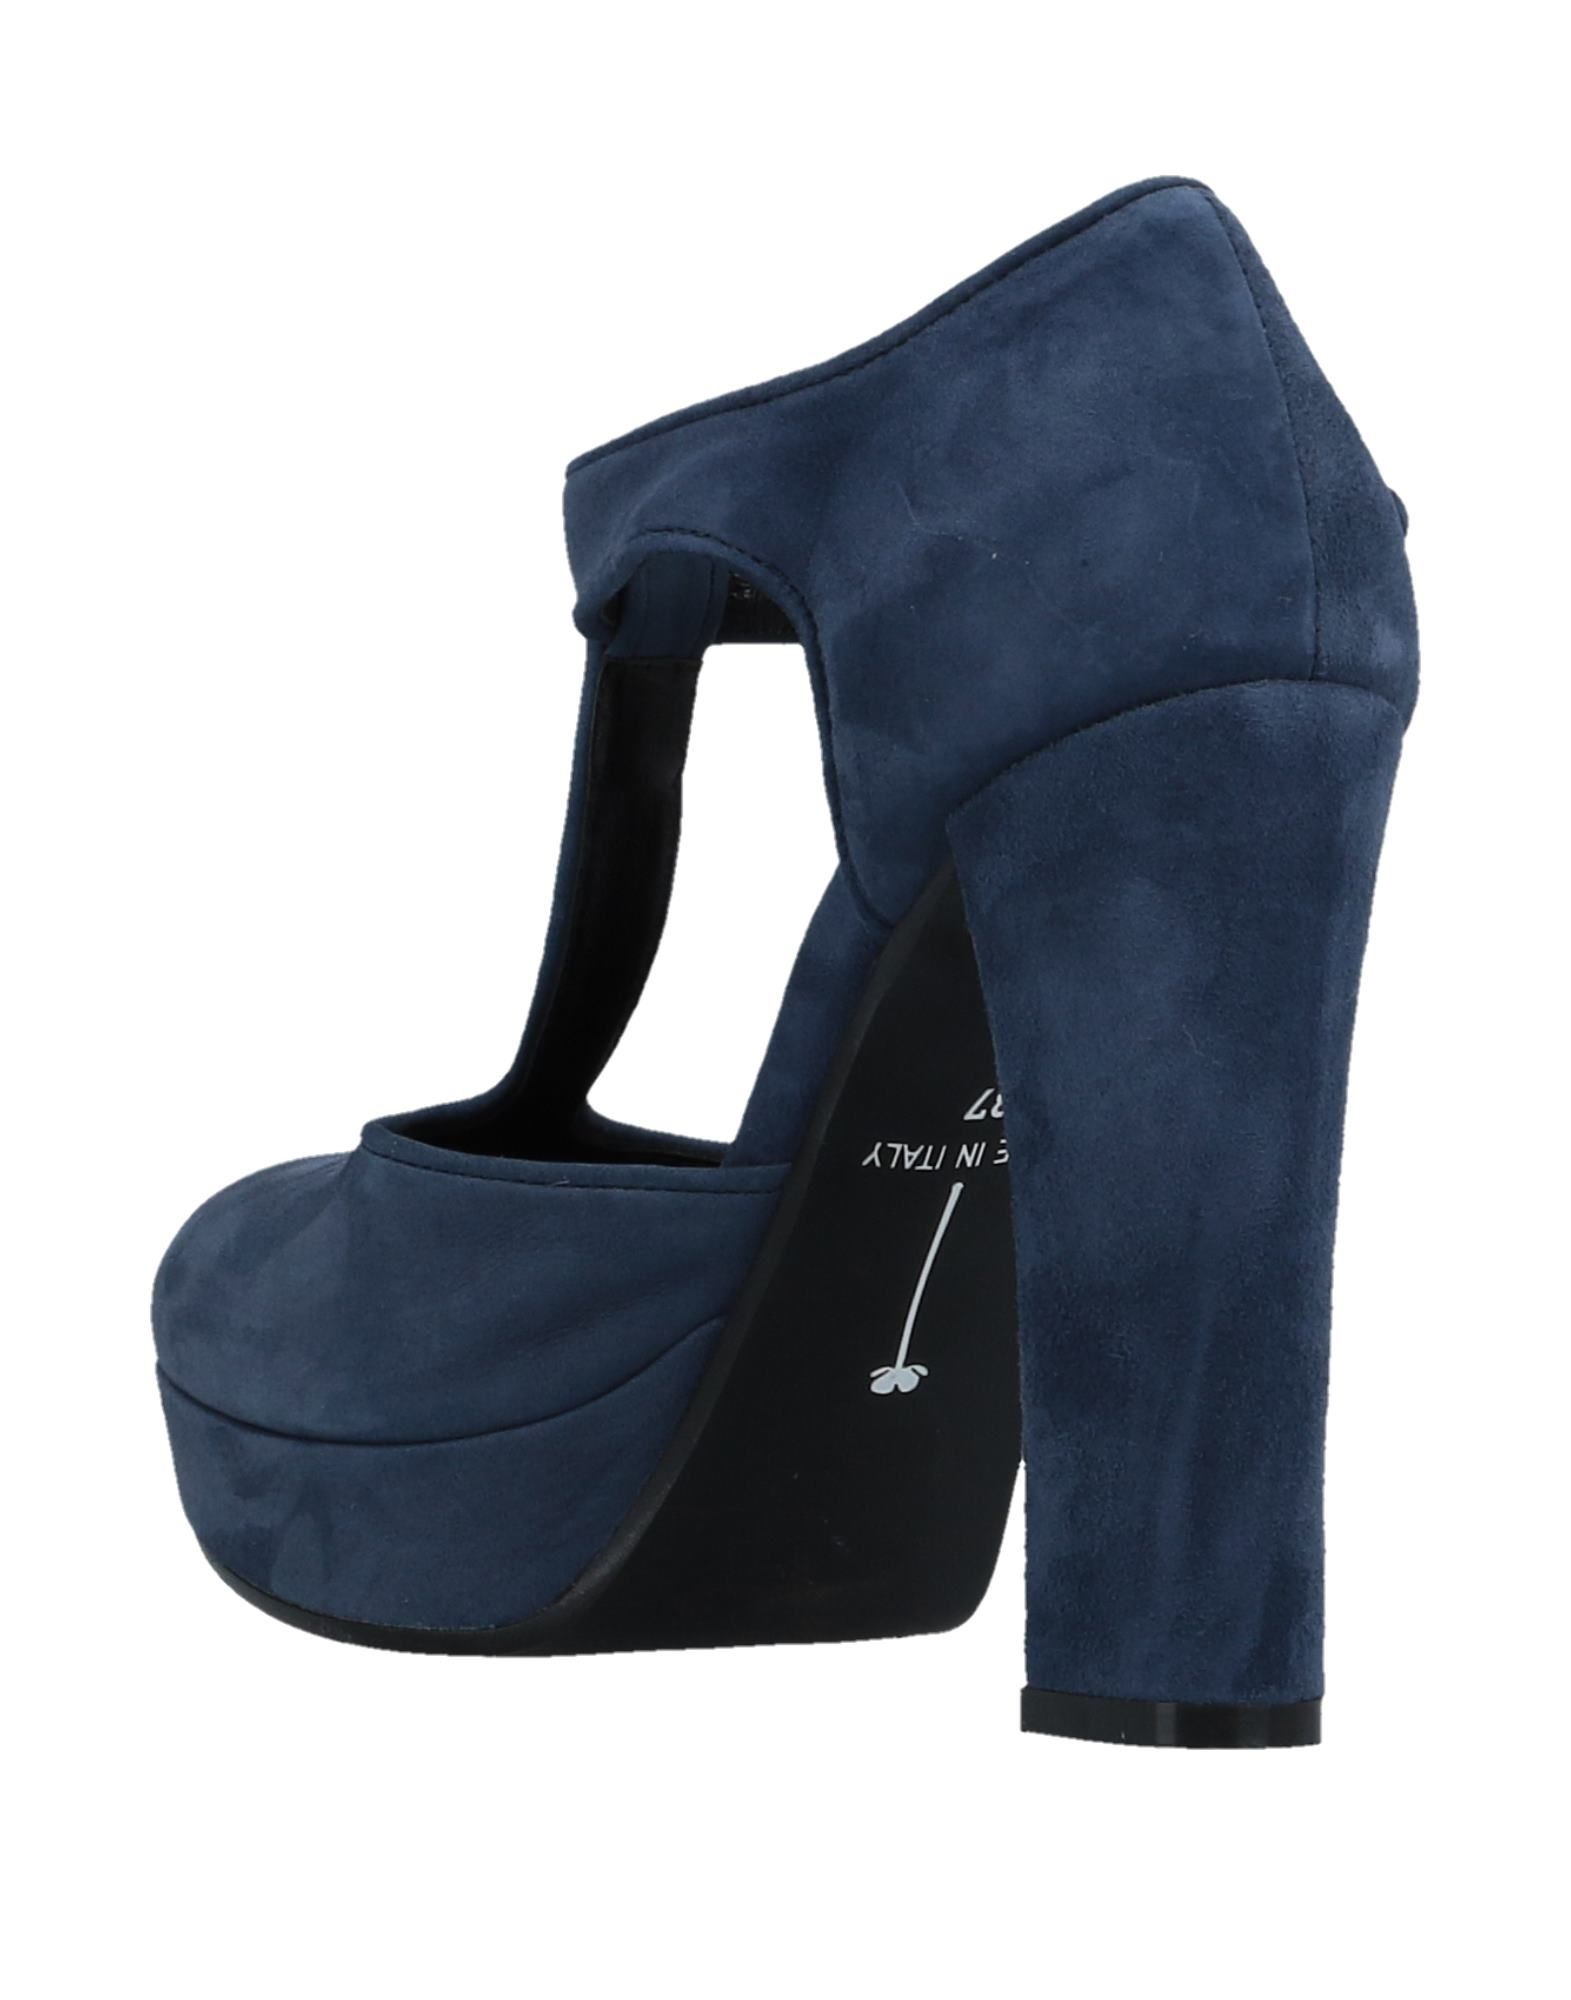 Stilvolle billige Schuhe Fiorifrancesi  Pumps Damen  Fiorifrancesi 11512426MW c8b693